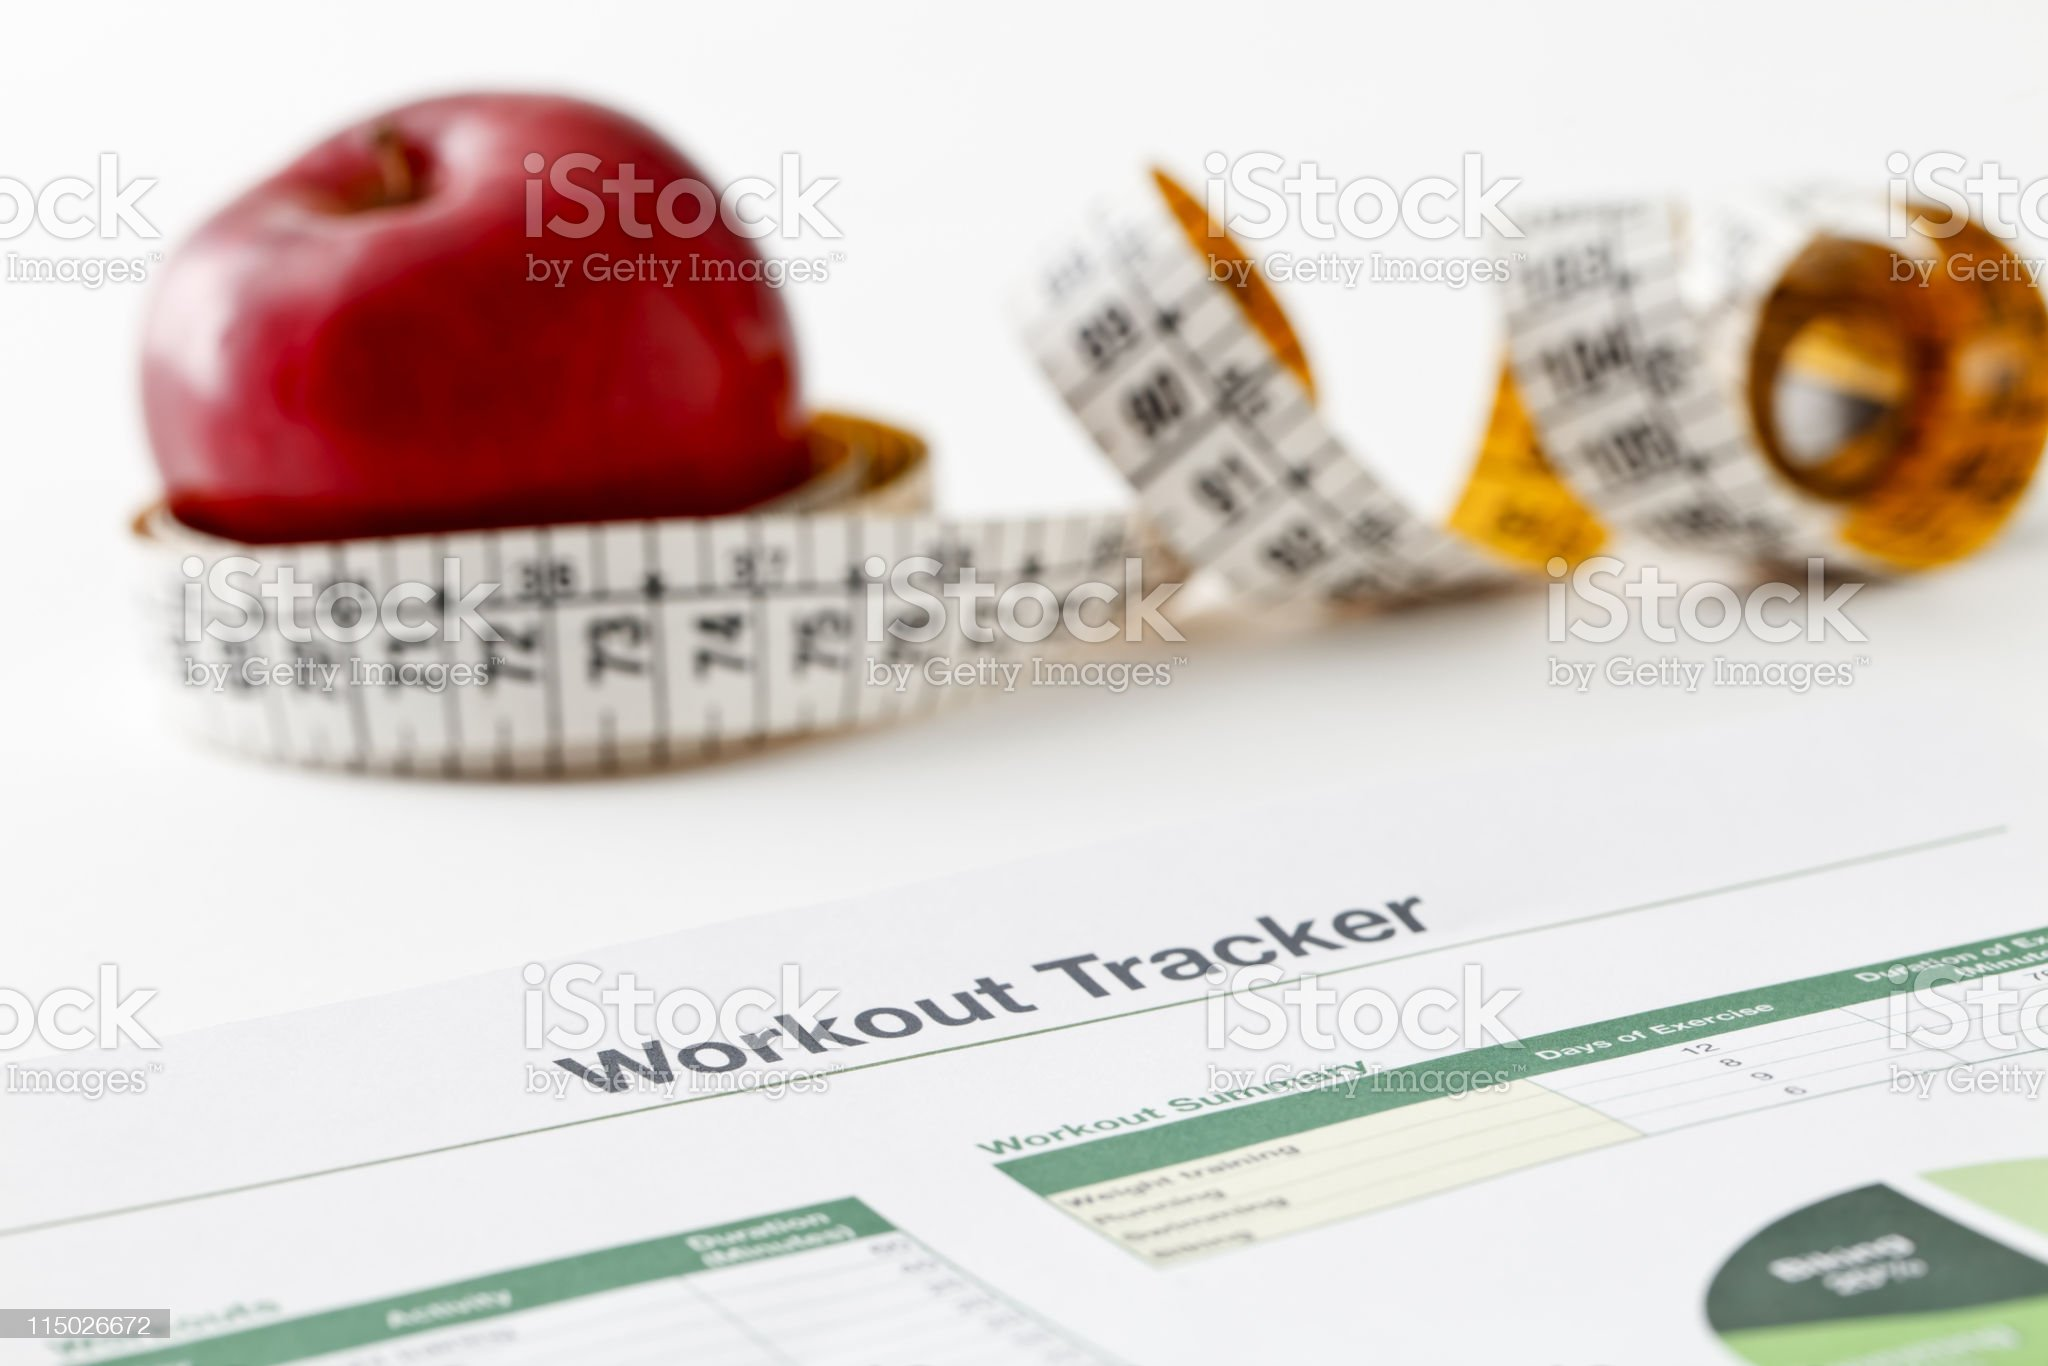 Workout tracker printout royalty-free stock photo